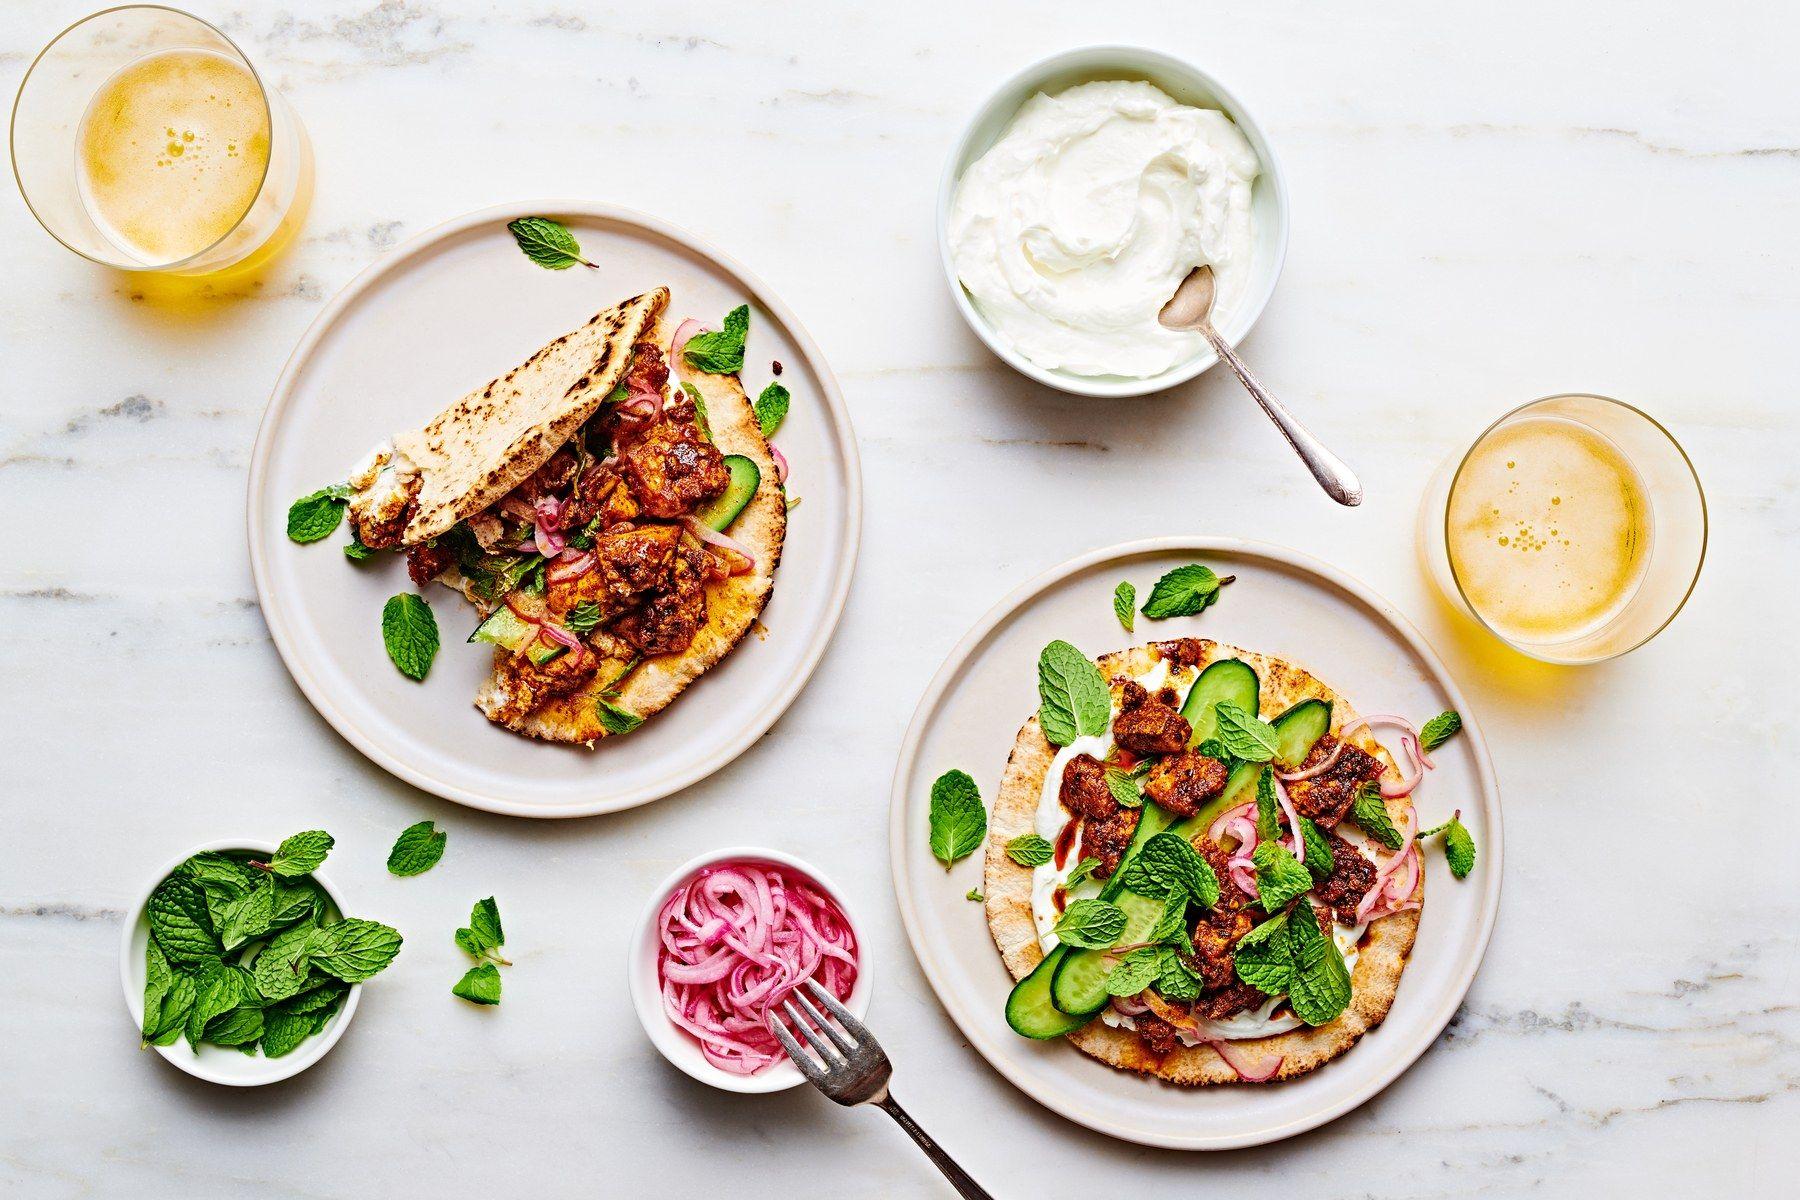 Shawarma Spiced Tofu Pita Wraps Recipe In 2020 Vegetarian Recipes Dinner Vegetarian Dinner Party Vegetarian